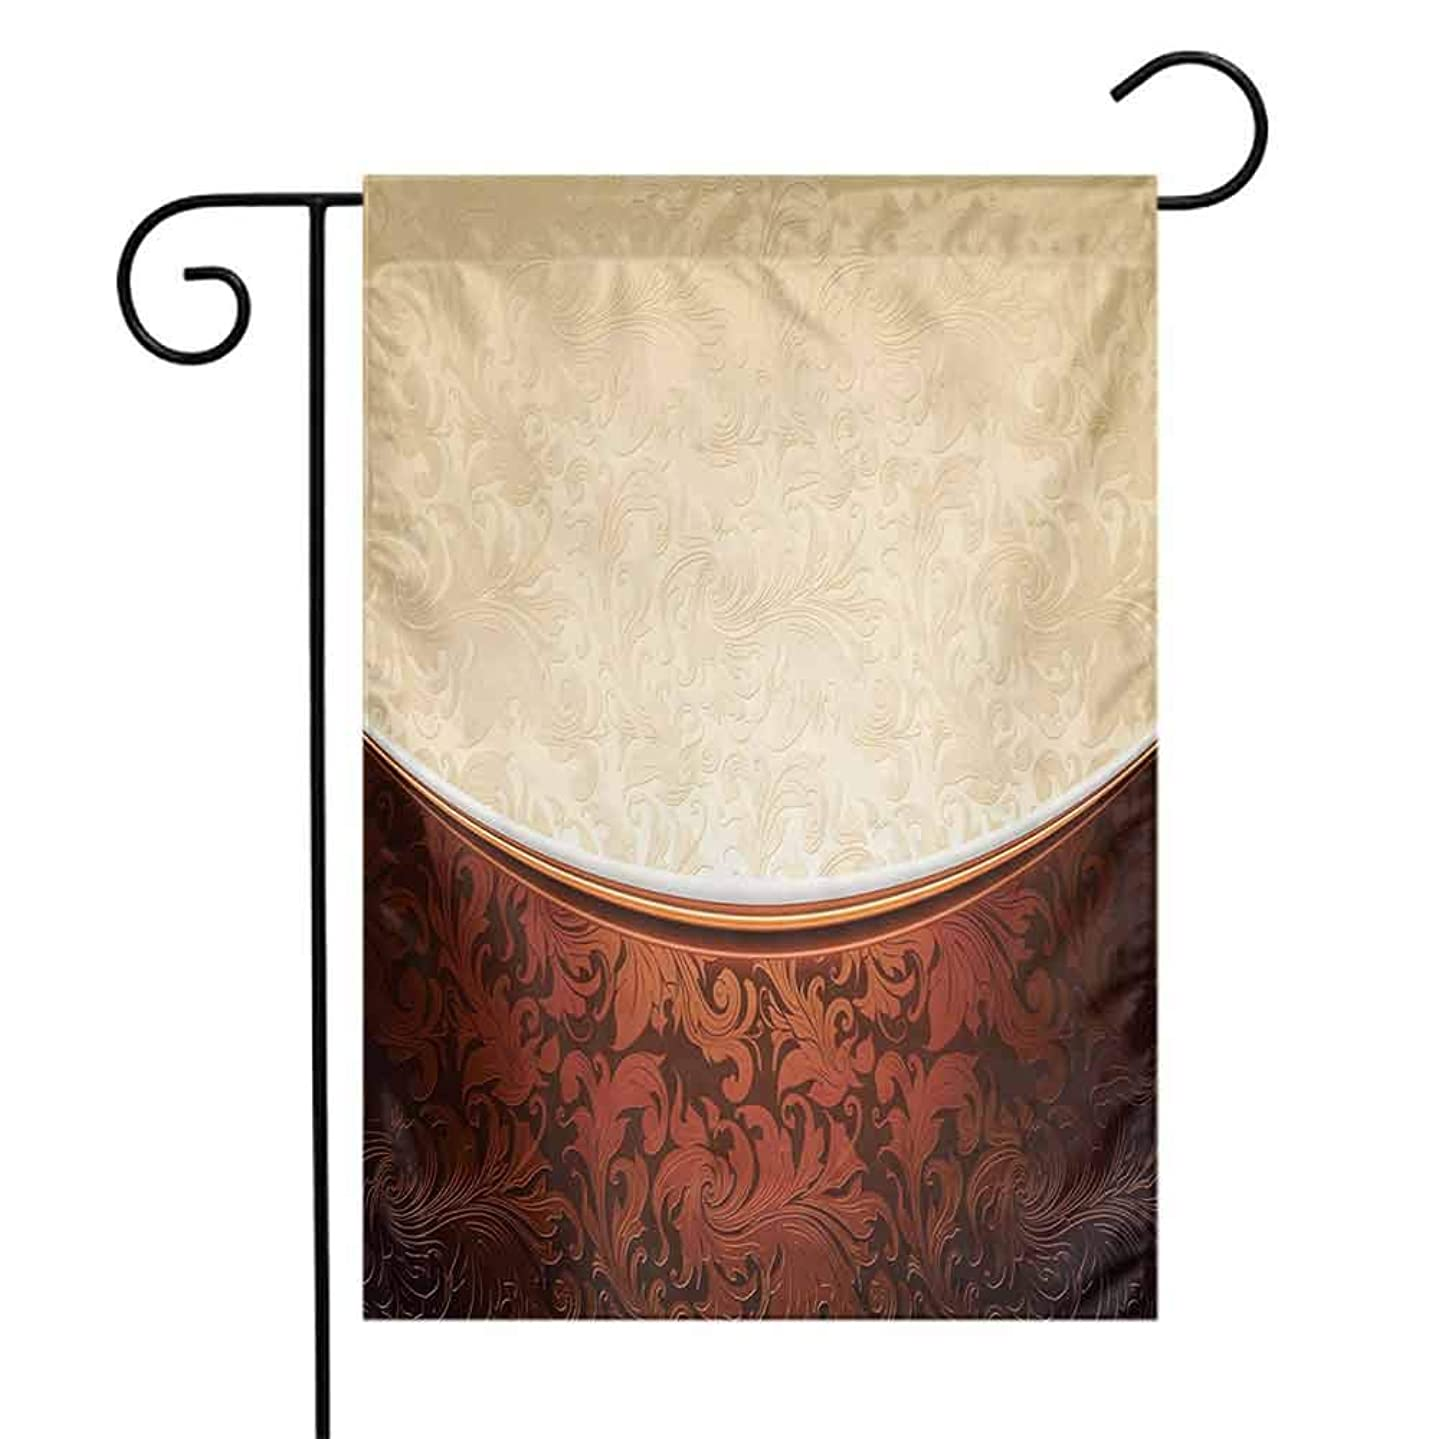 Mannwarehouse Chocolate Garden Flag Victorian Motifs in Bicolor Baroque Inspired Antique Arrangement Ornate Design Premium Material W12 x L18 Beige Brown